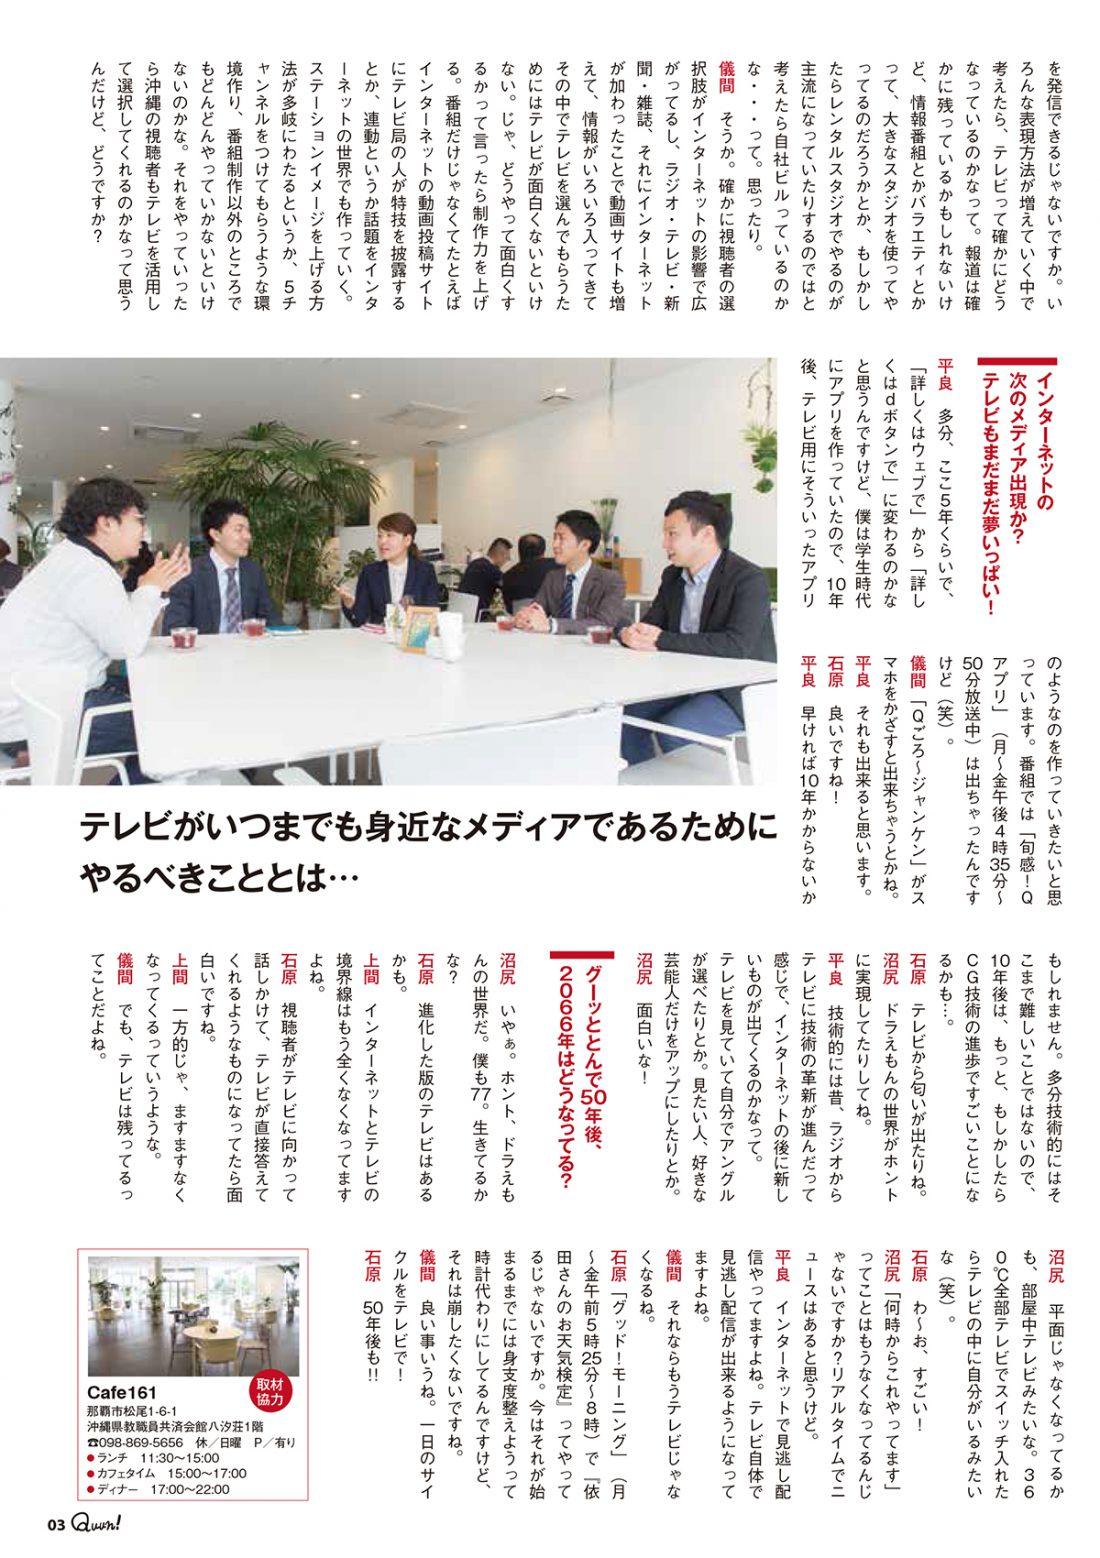 https://www.qab.co.jp/qgoro/wp-content/uploads/quun_0605-1100x1558.jpg